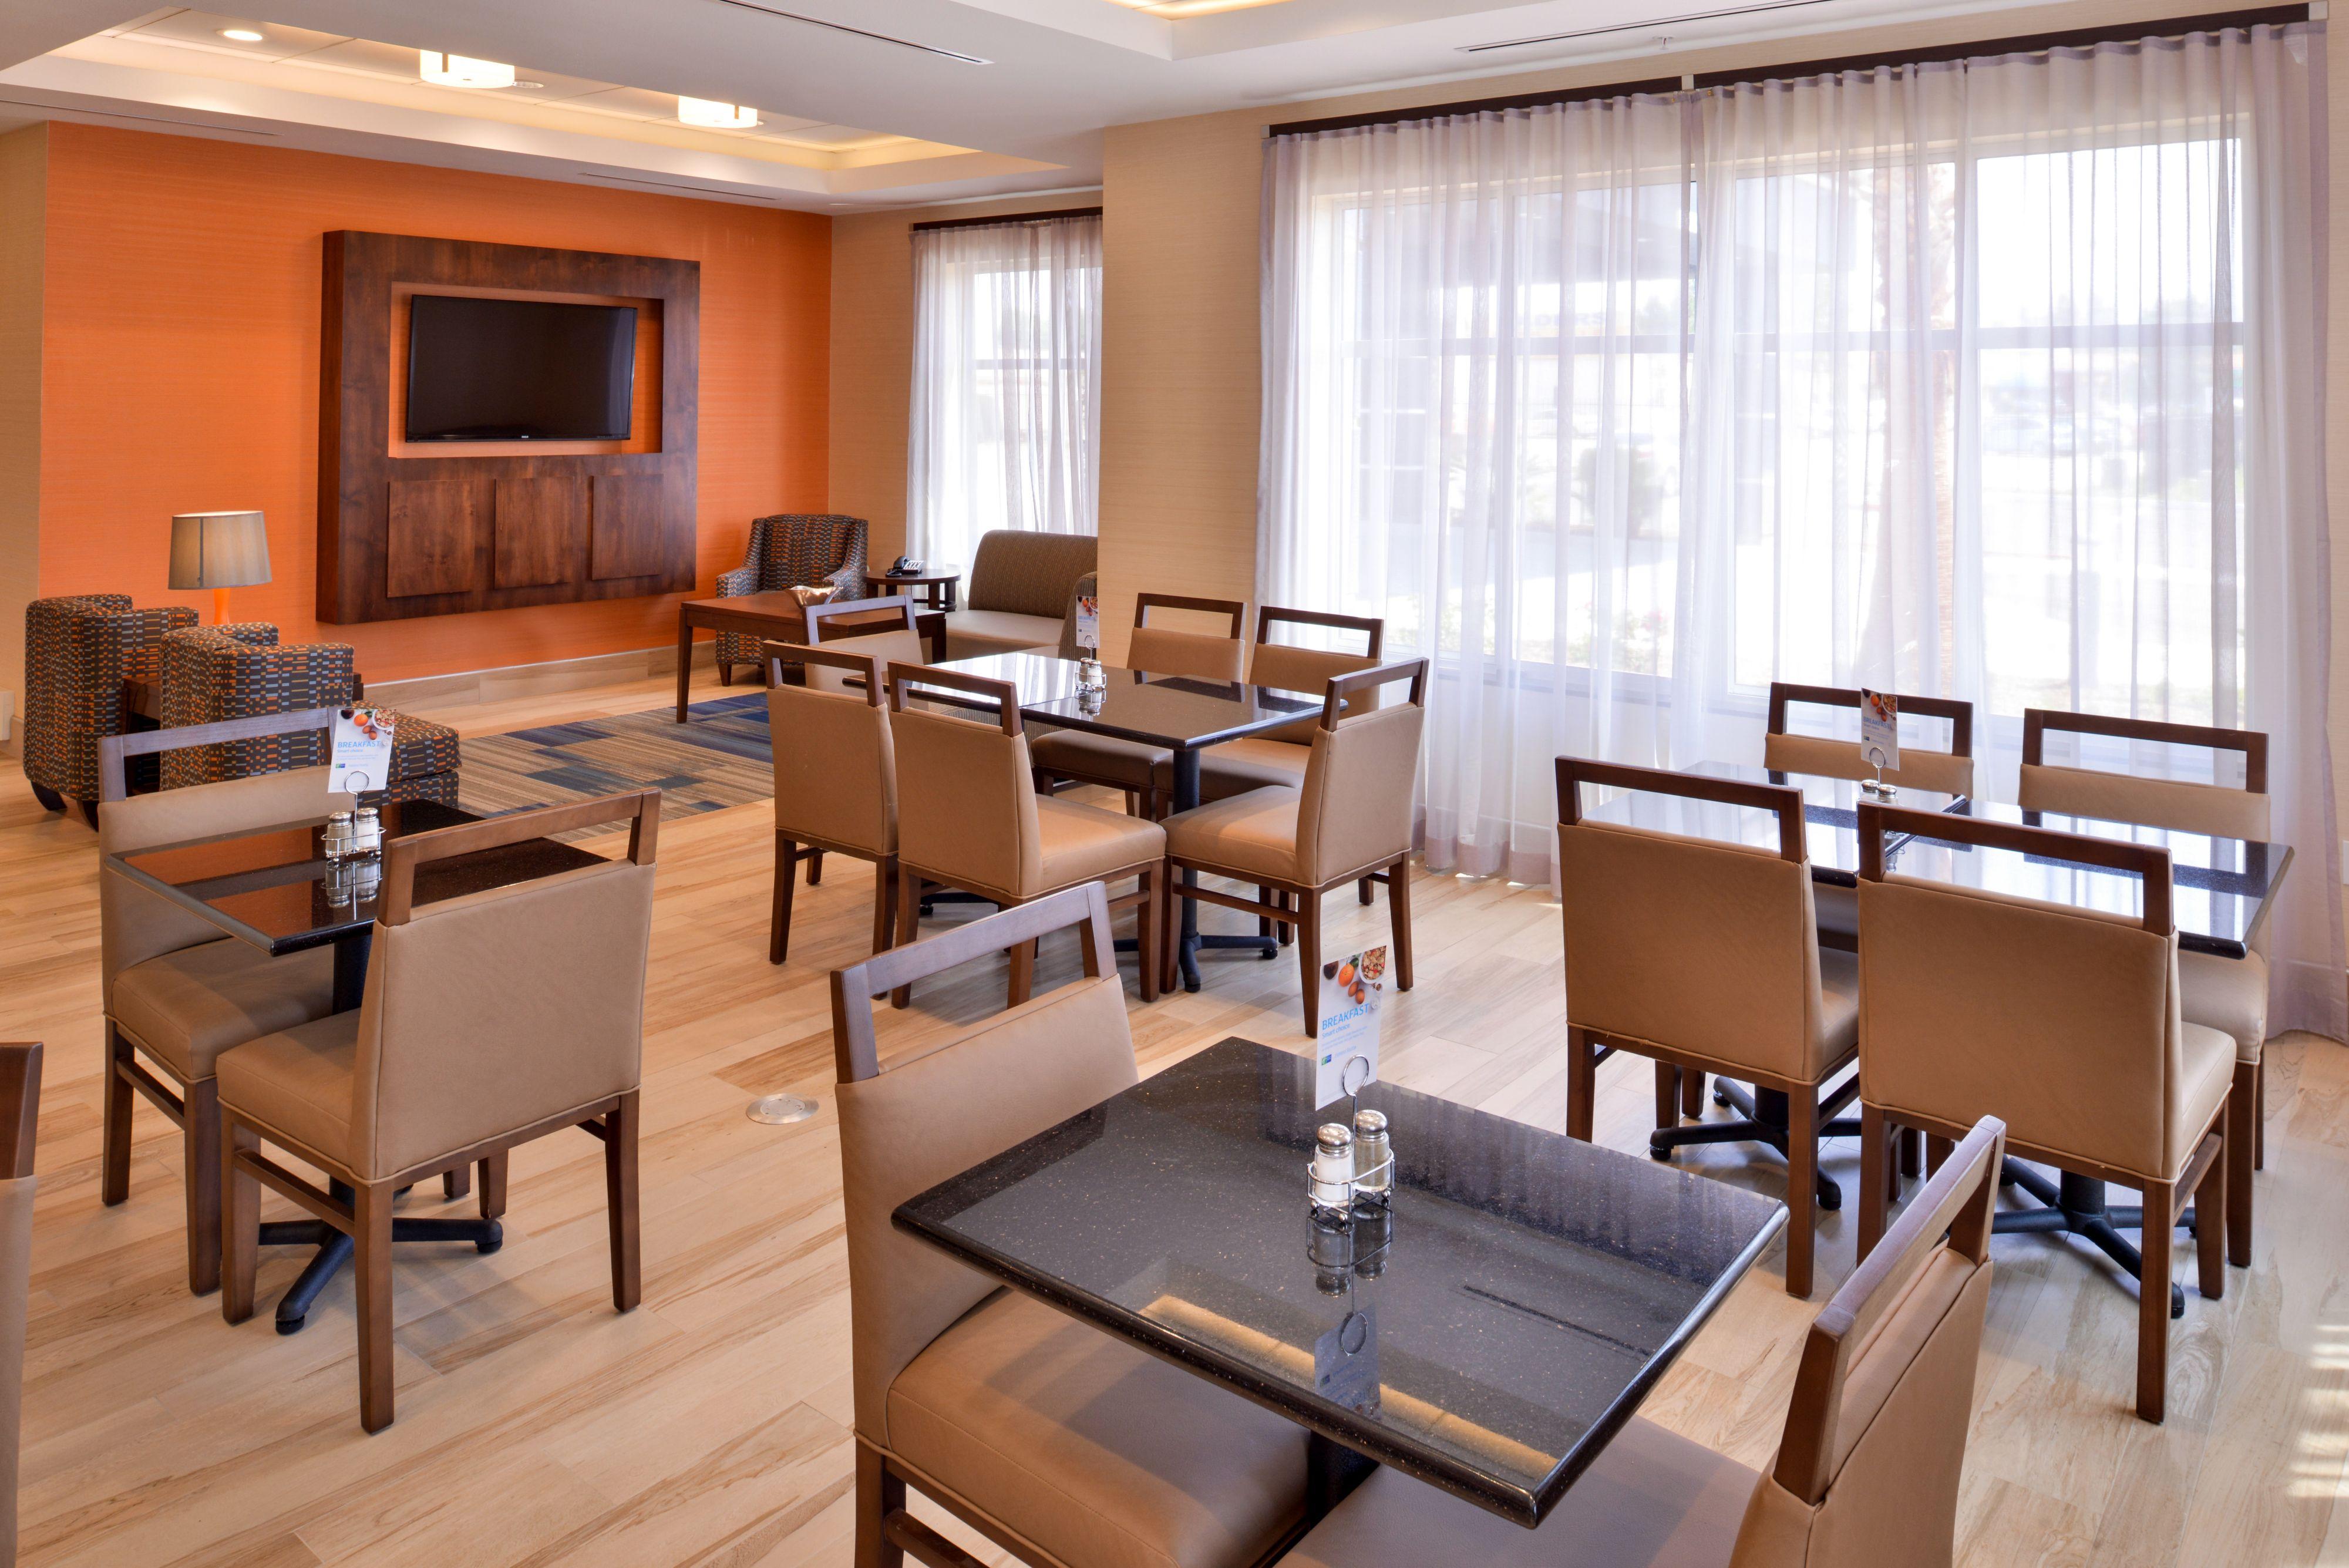 Holiday Inn Express & Suites Loma Linda- San Bernardino S image 4